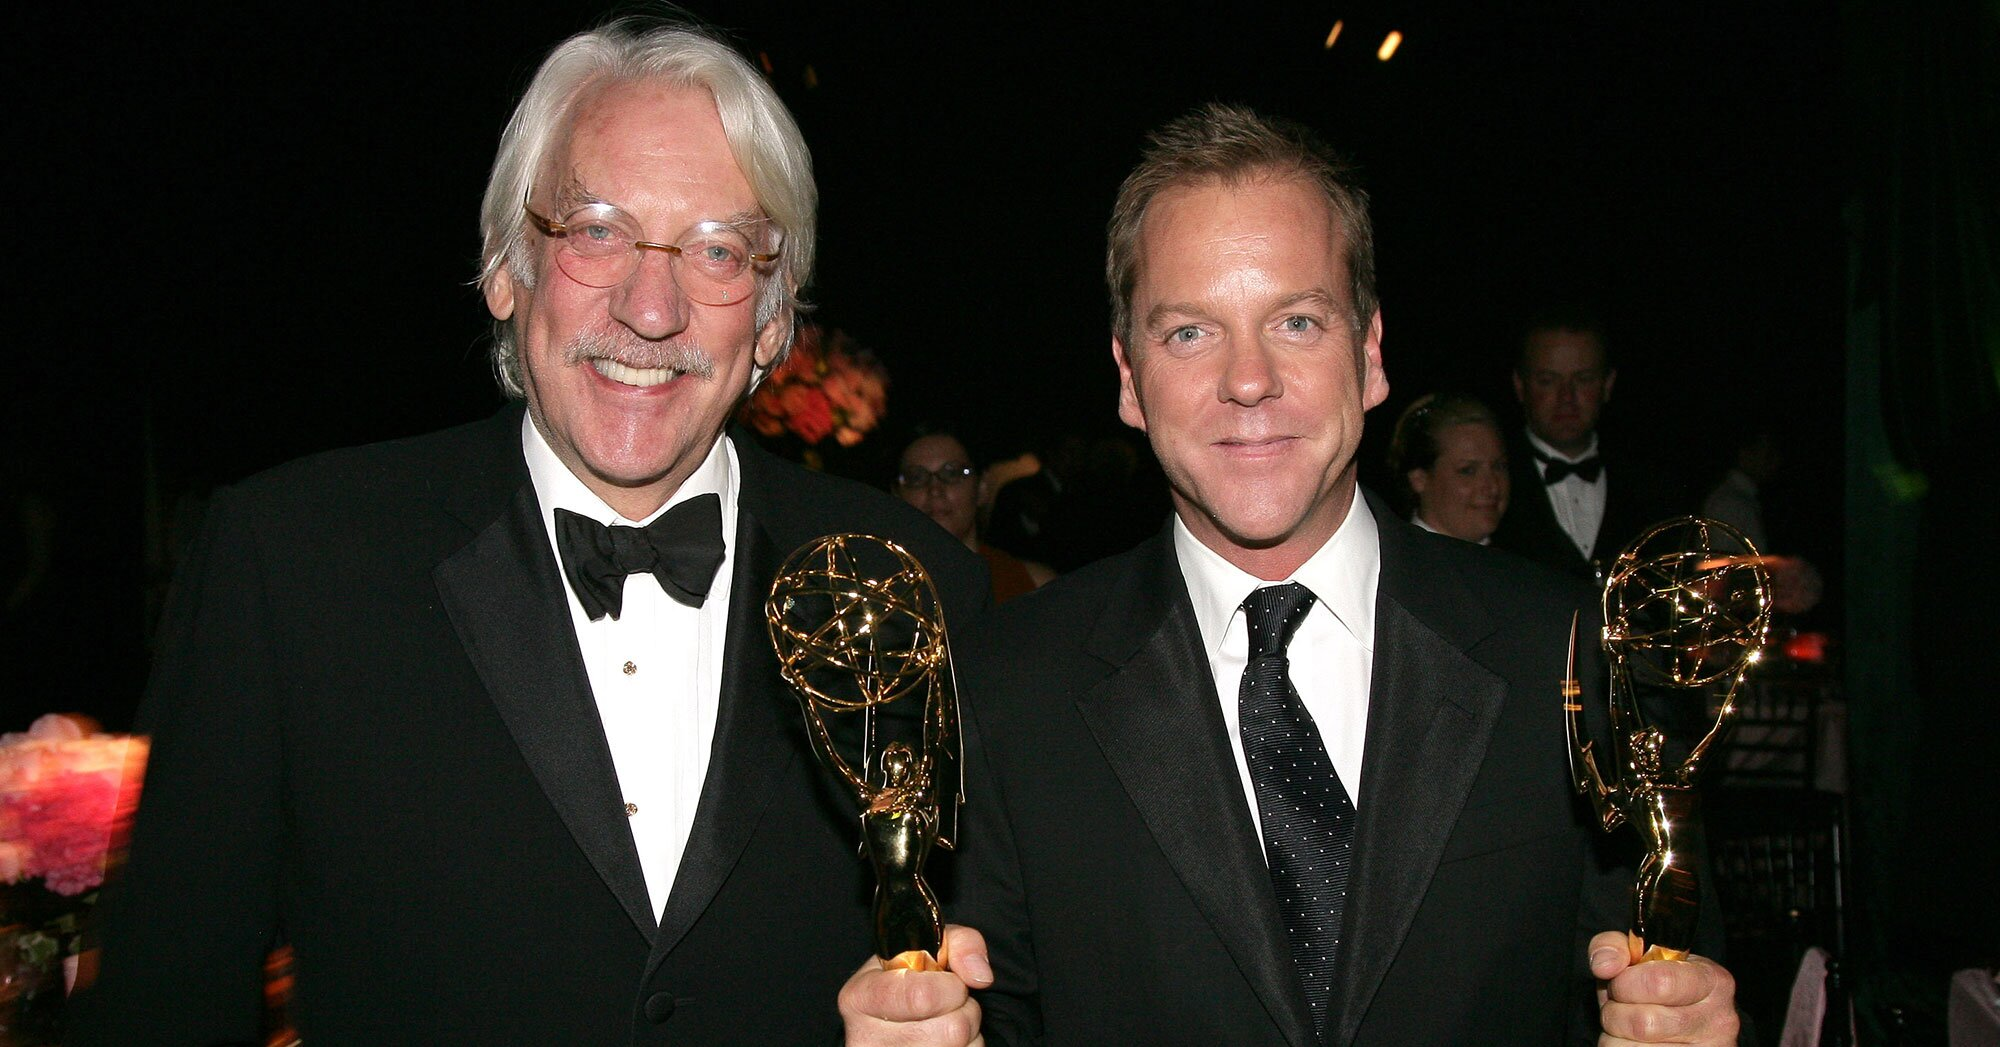 13 Emmy-winning parents and their Emmy Award-winning children